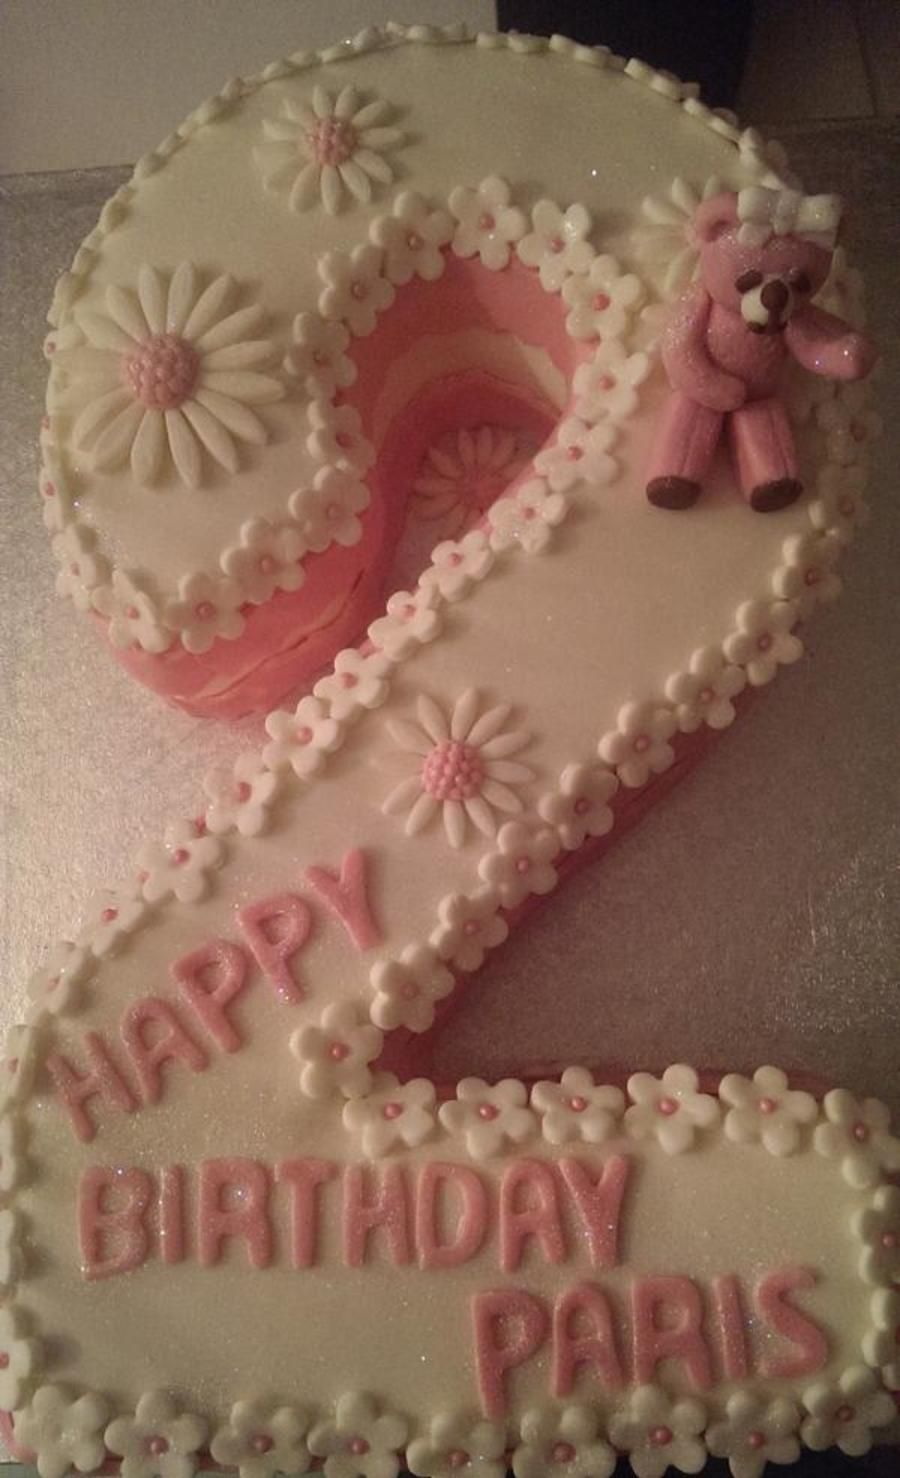 Number 2 Cake 2nd Birthday Cake Girl Minnie Mouse Birthday